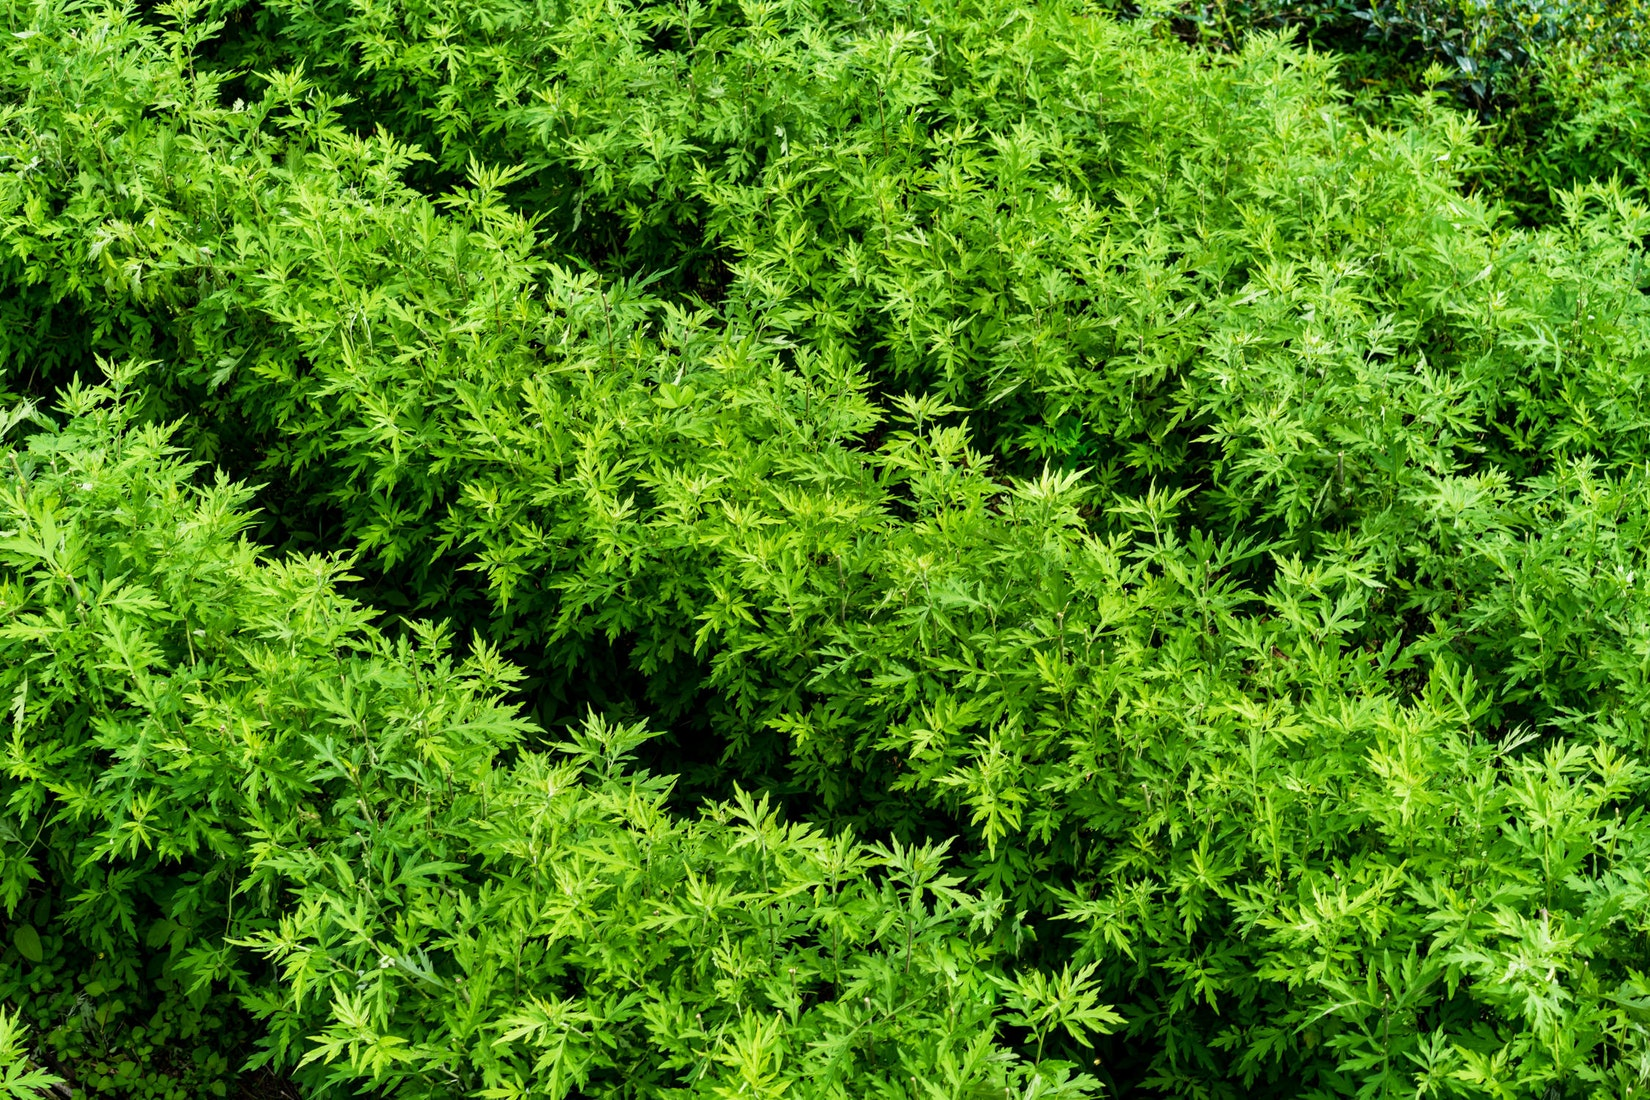 Rows of tea plants